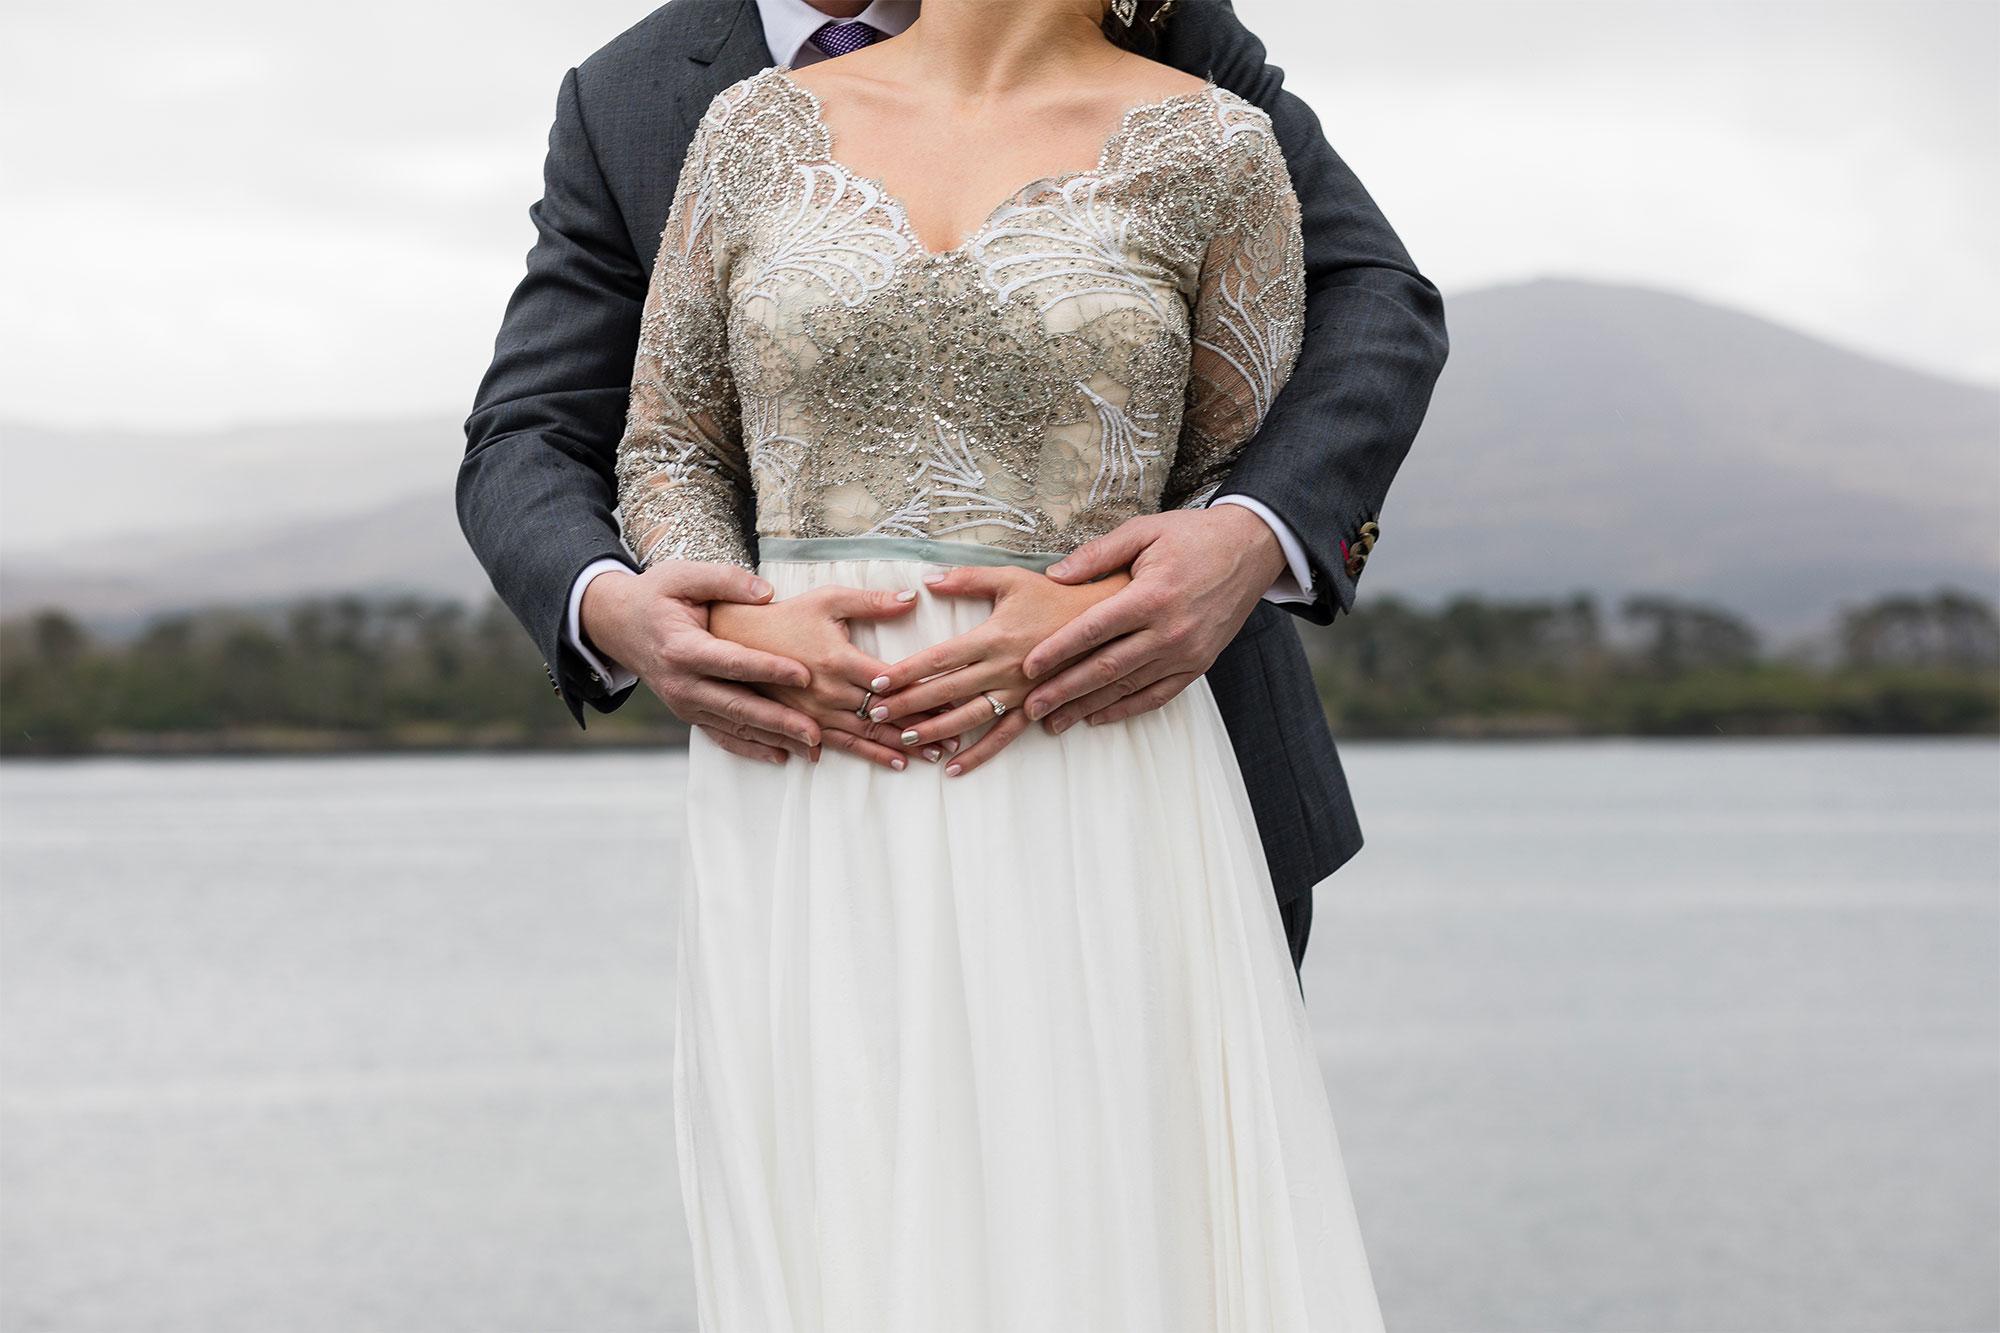 51900c8f2f An French Lace Dress + First Look for an Elegant Irish + Swedish Fusion  Wedding | Love My Dress® UK Wedding Blog + Wedding Directory